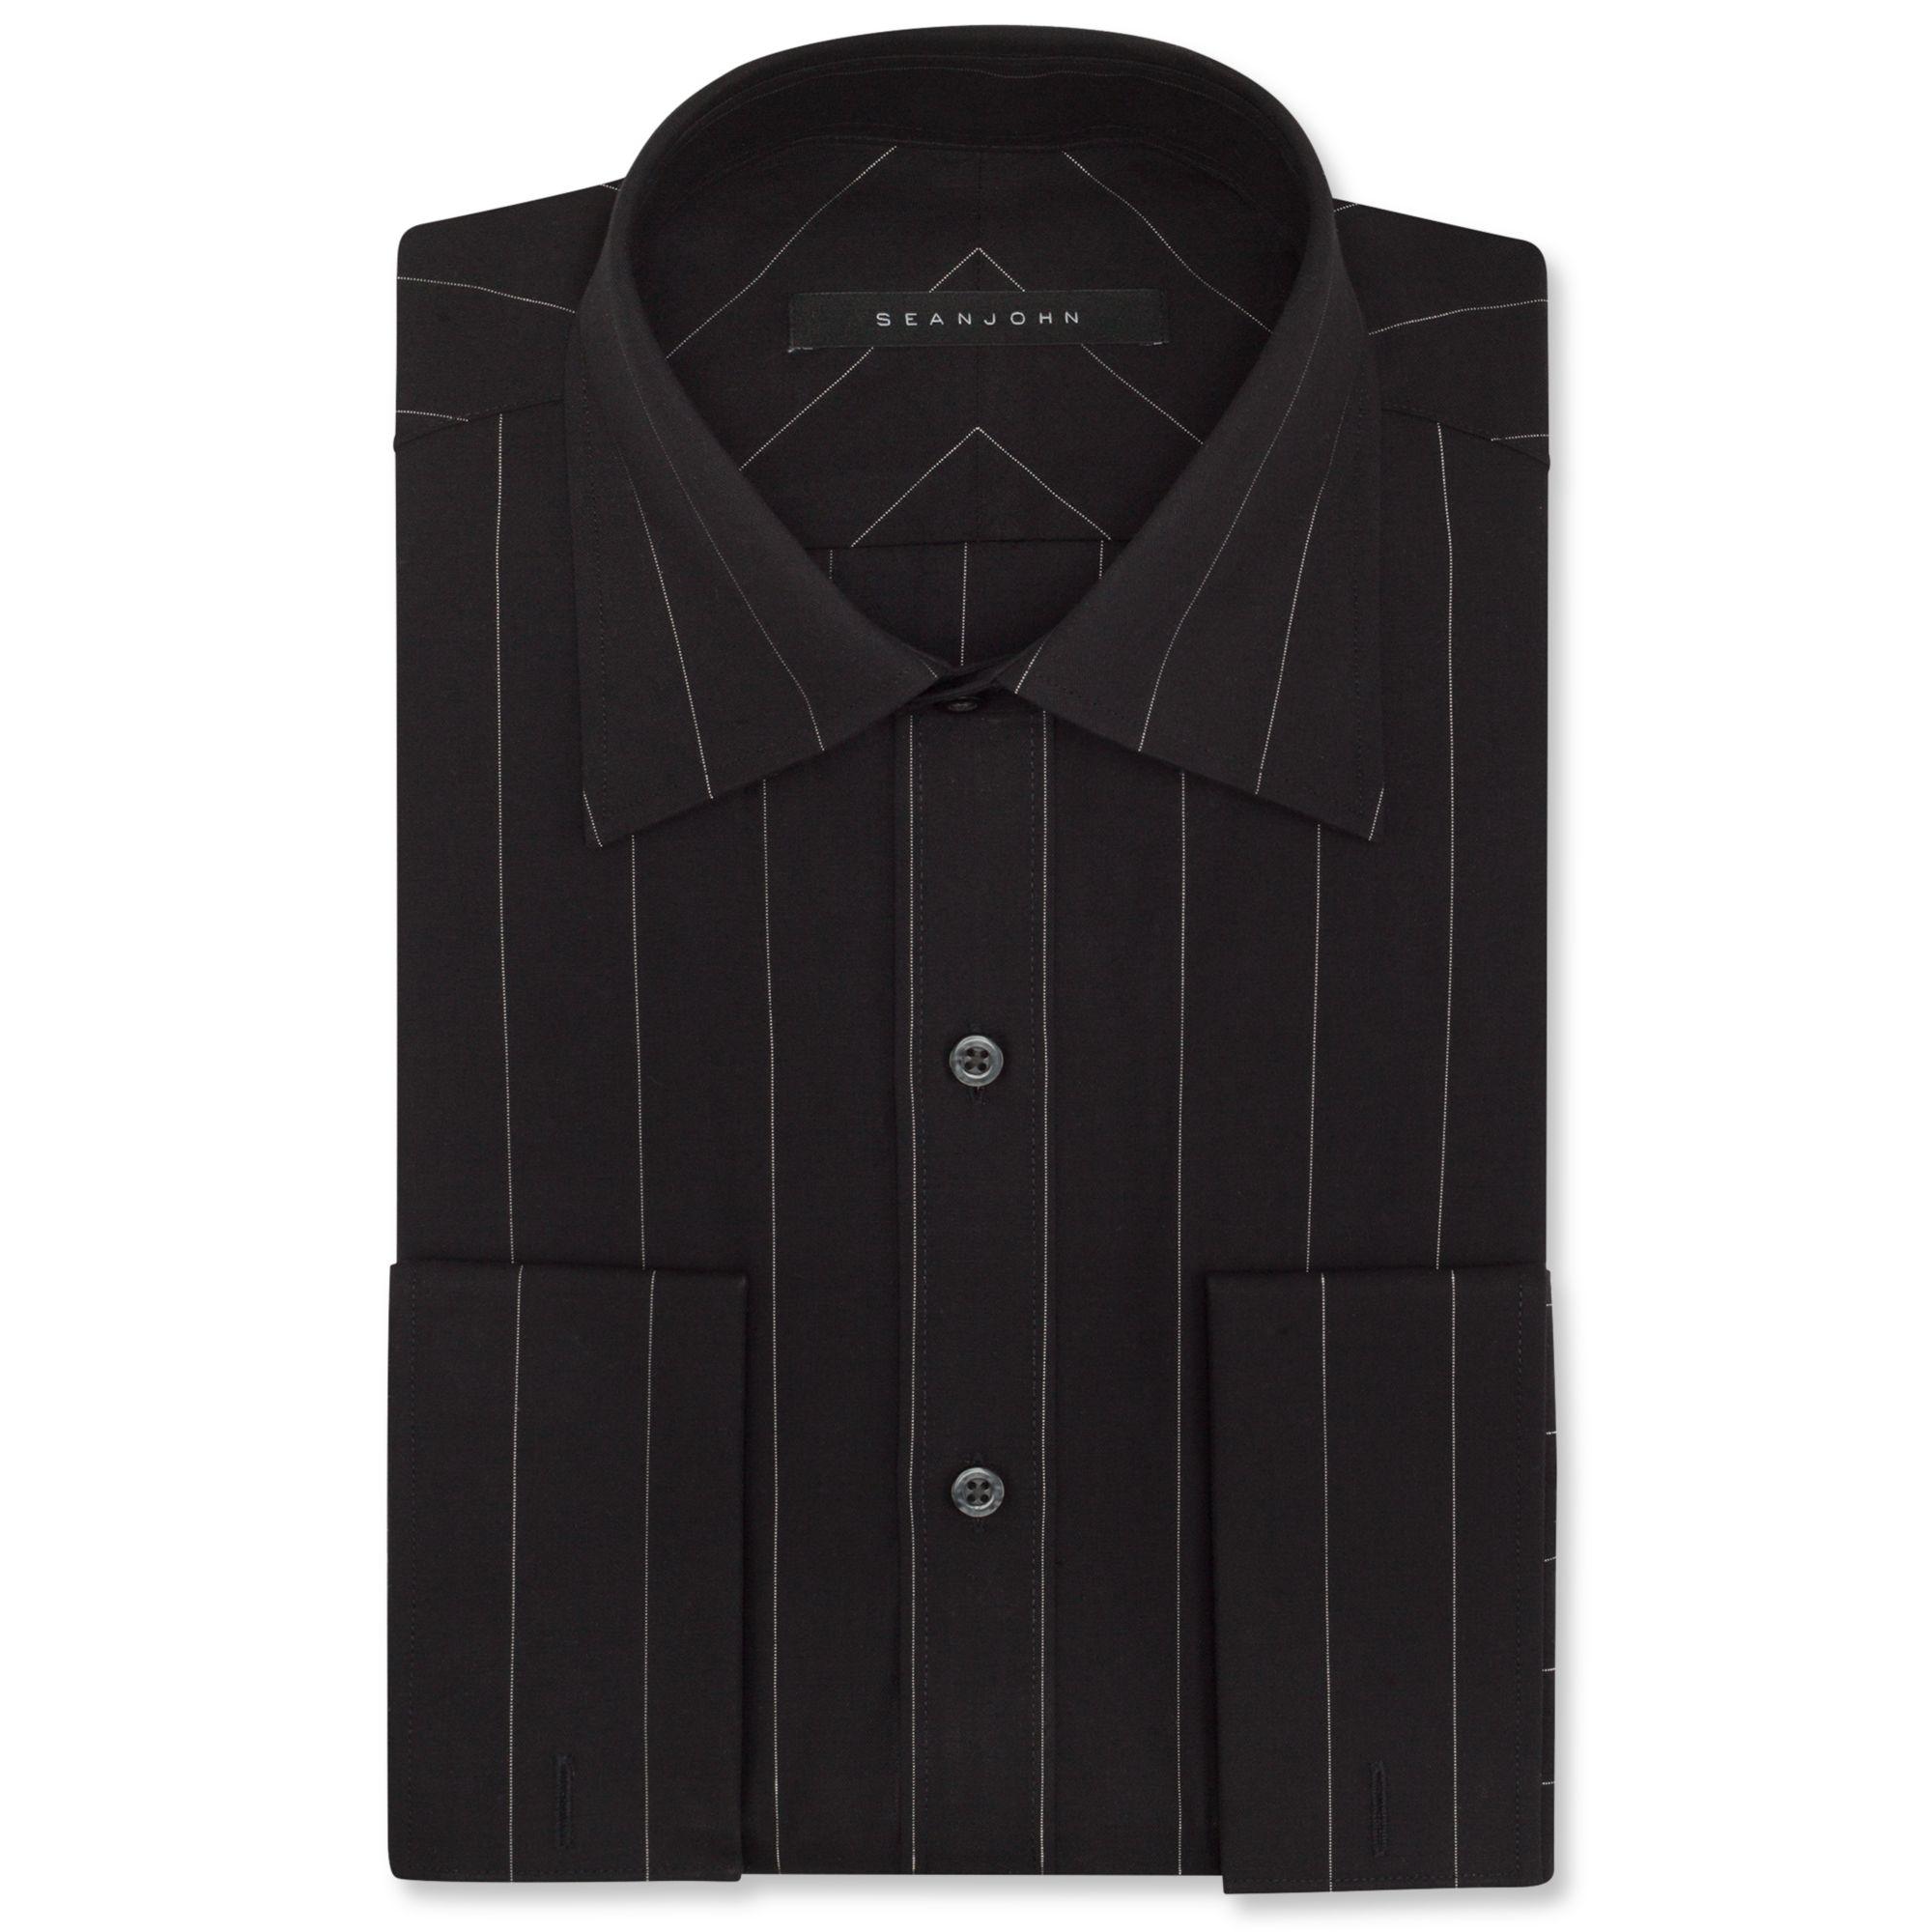 Sean john big and tall lurex pinstripe french cuff shirt for Big and tall french cuff dress shirts